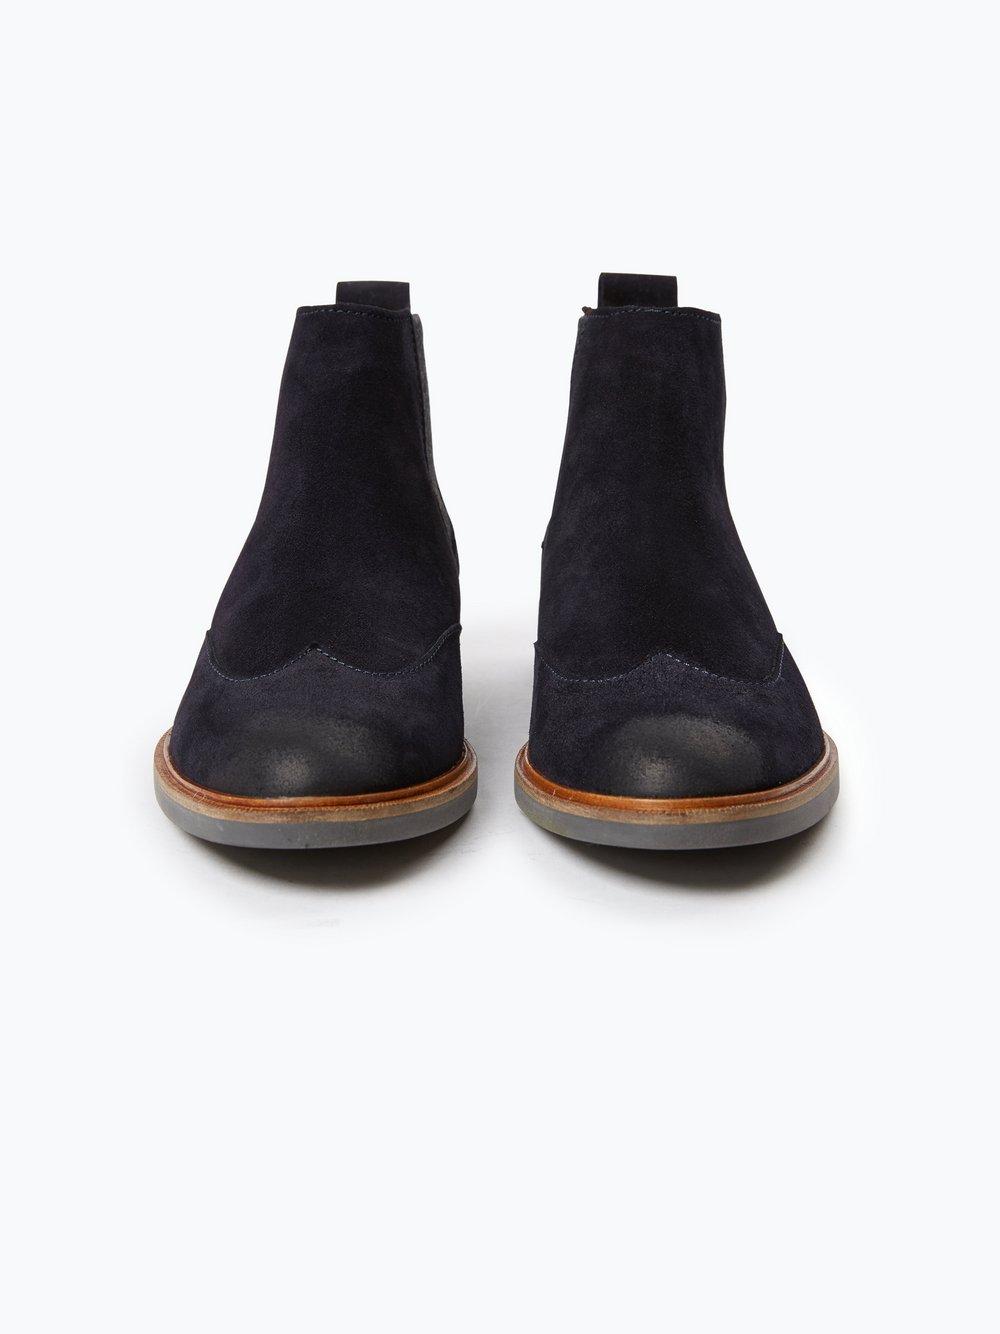 Marc O'Polo Damen Chelsea Boots aus Veloursleder online